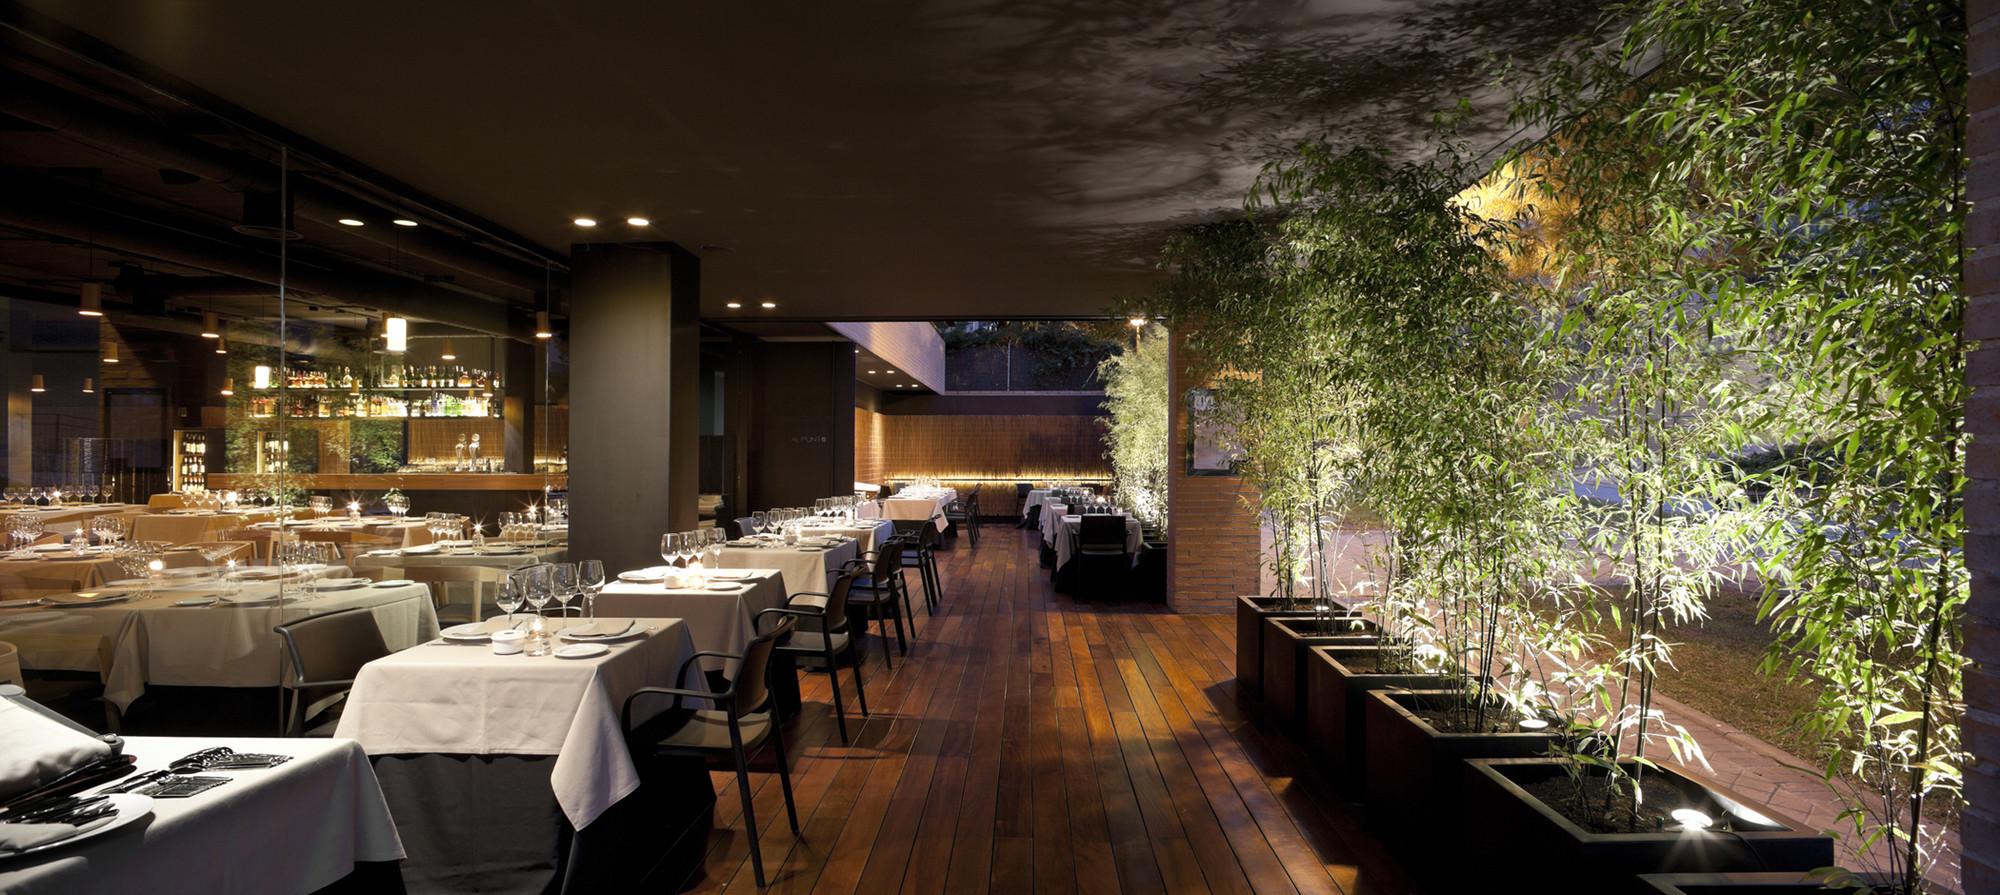 Al Punto Restaurant / Estudio Mariano Martin